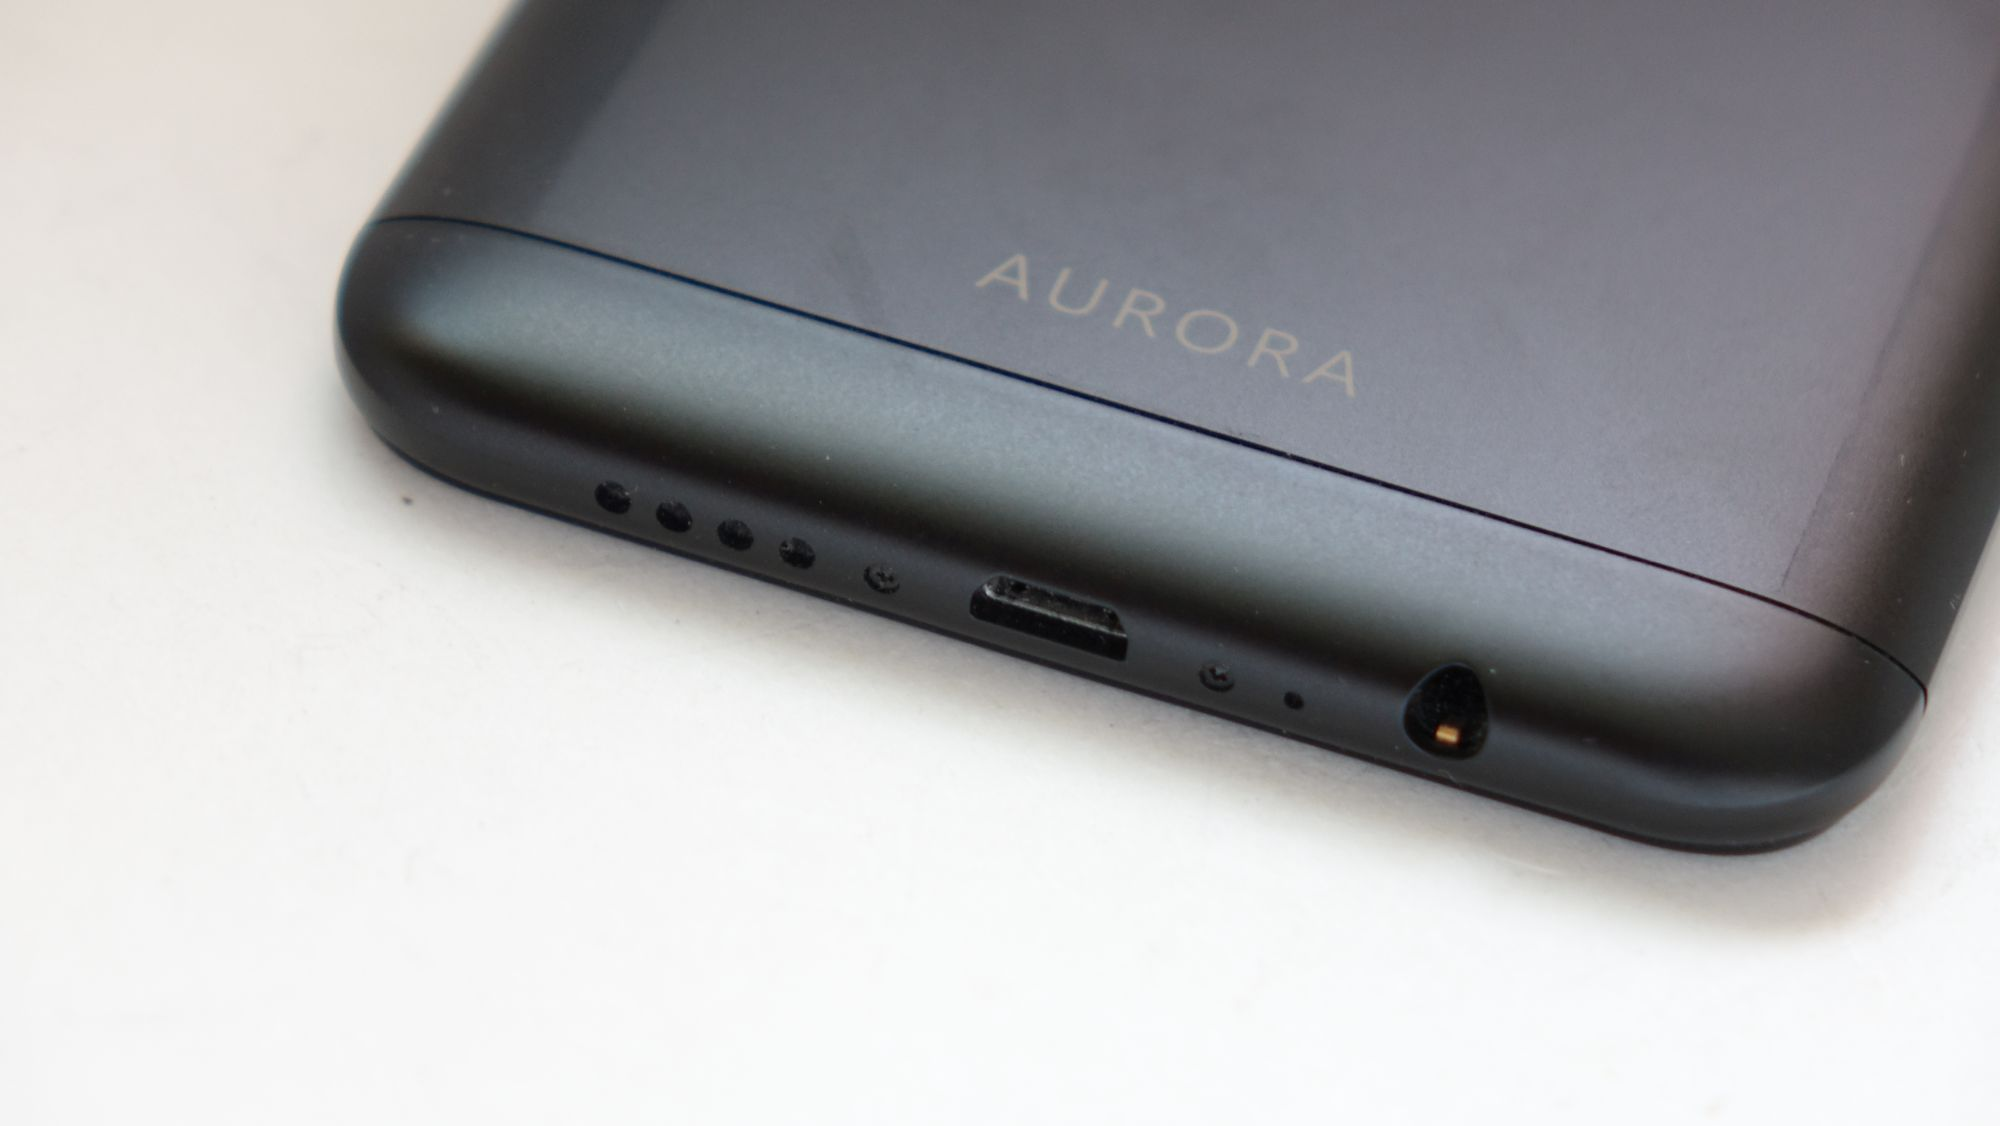 BQ Aurora usb